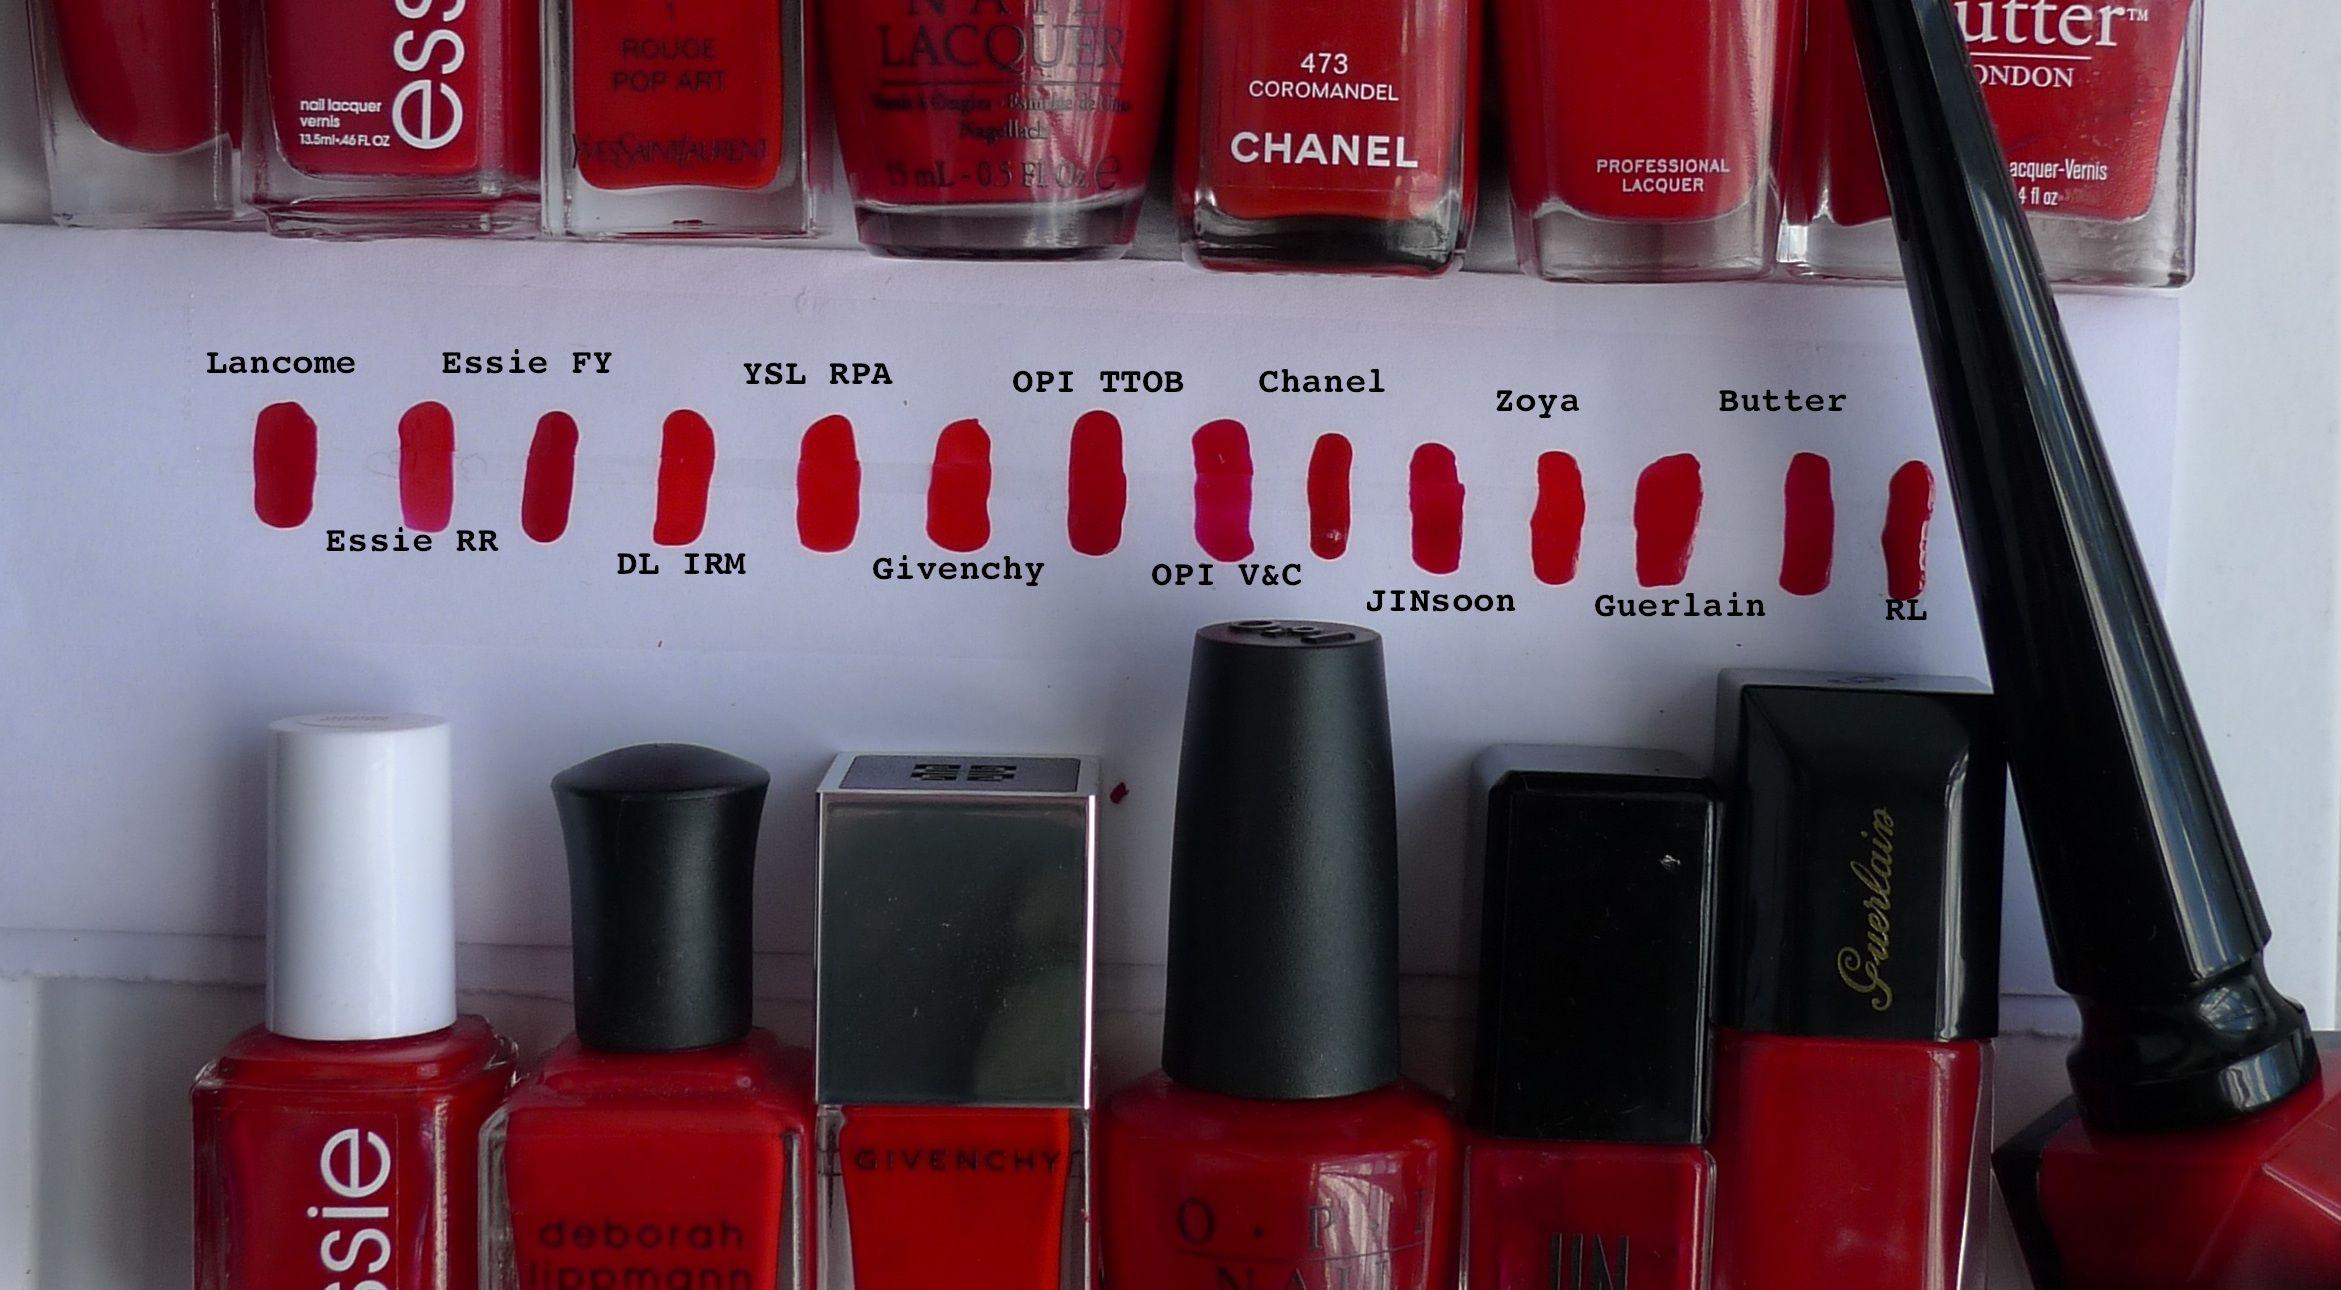 Christian Louboutin Nail Polish in Rouge Louboutin | manicures ...